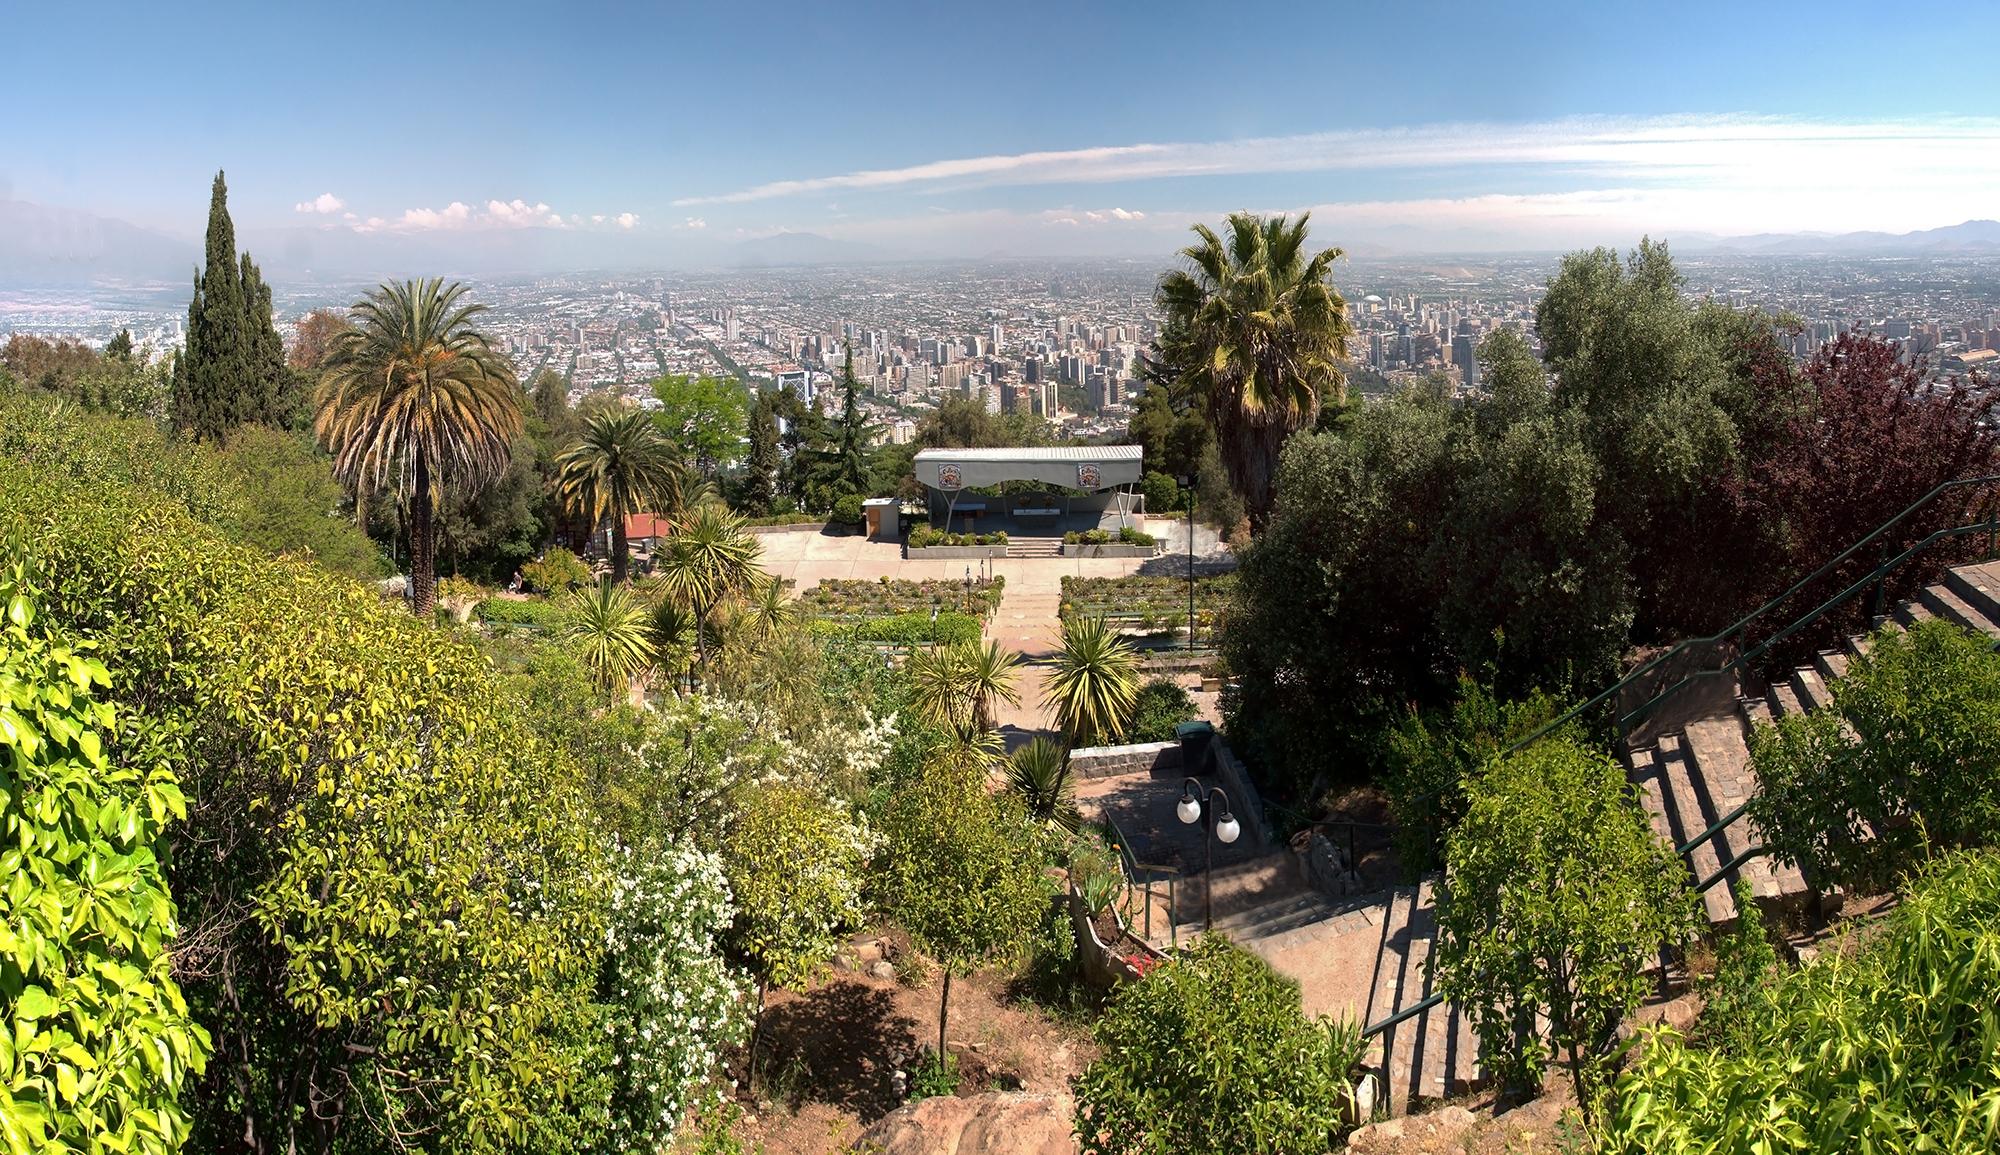 chile_santiago_bigstock-Santiago-De-Chile-15051434_resize.jpg